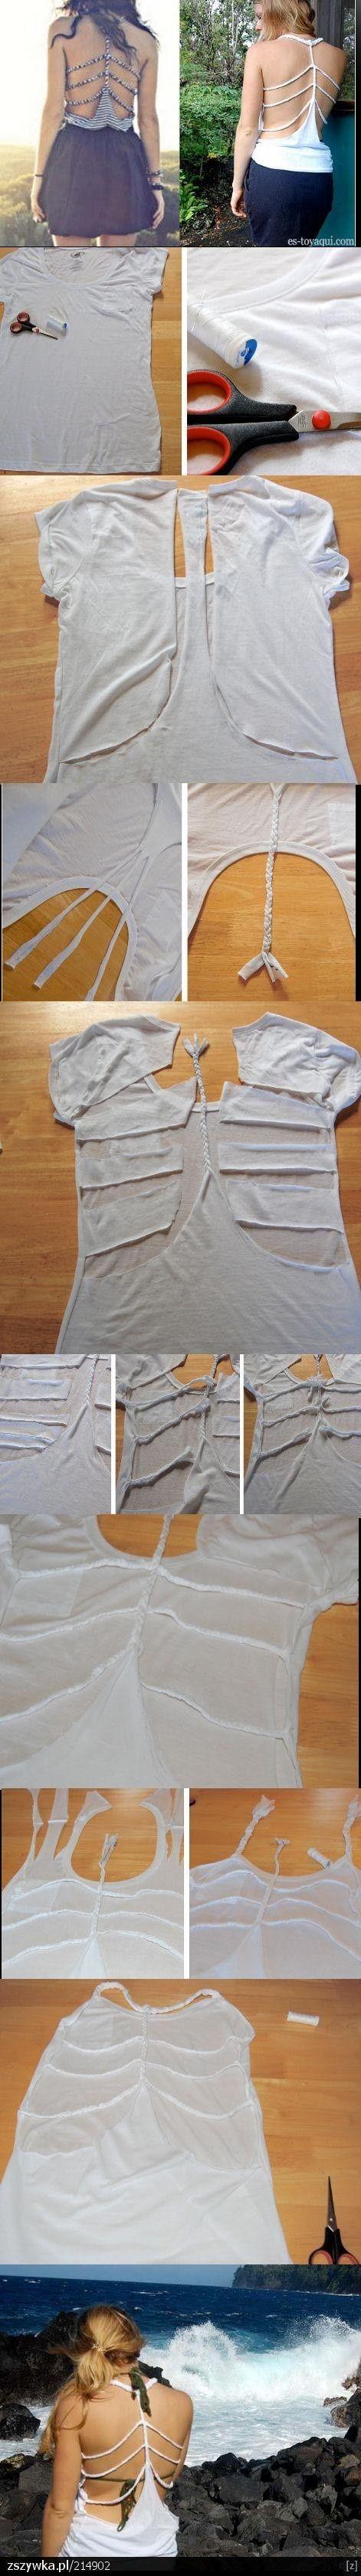 15 T-shirt DIY Crafts